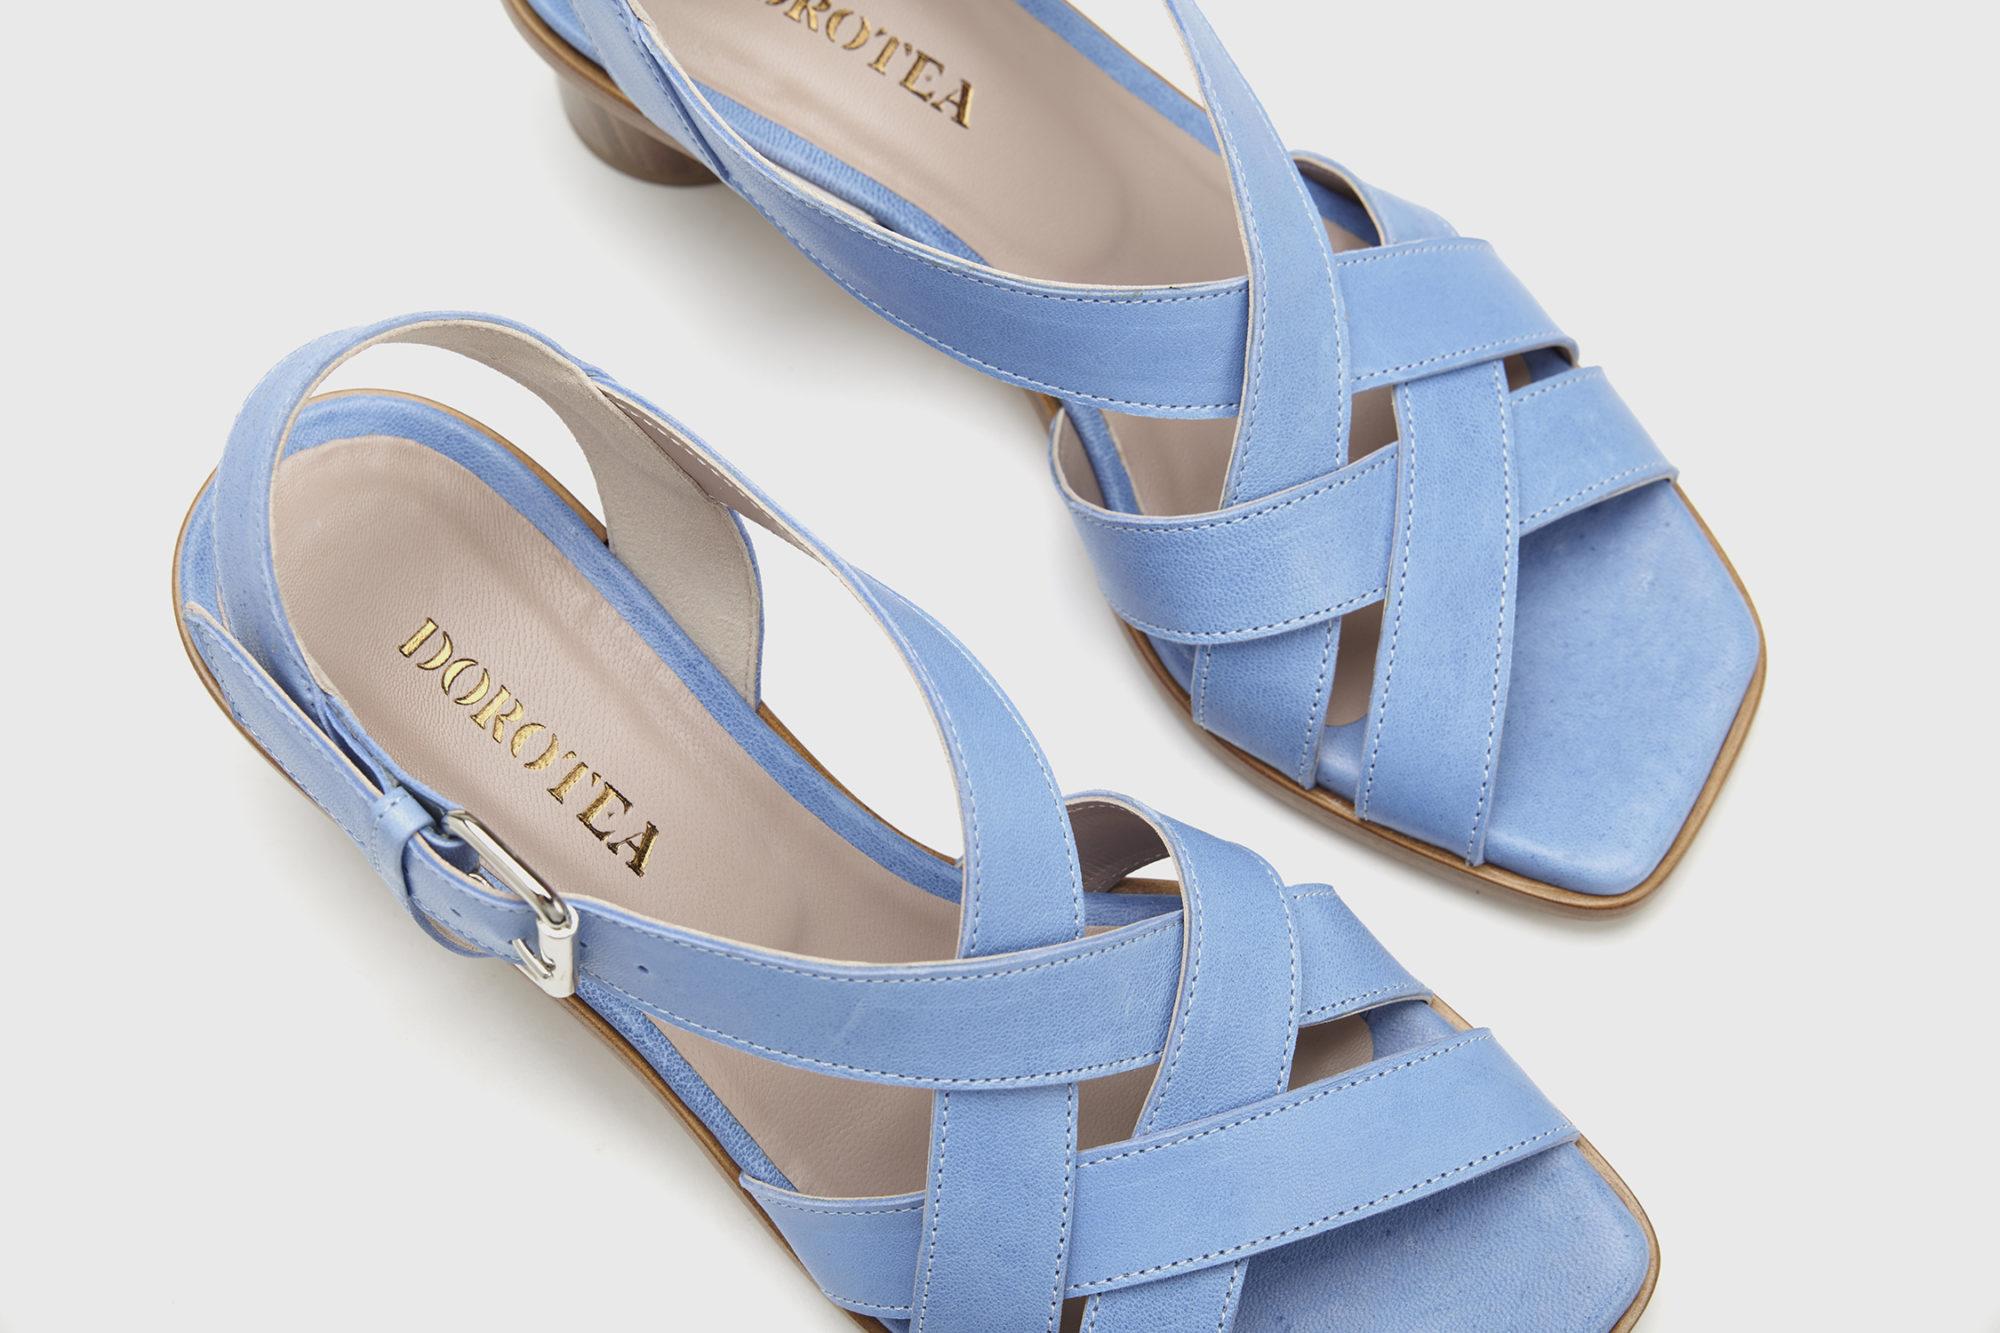 Sandalia de tacón medio Jeanne azul ss17 detalle